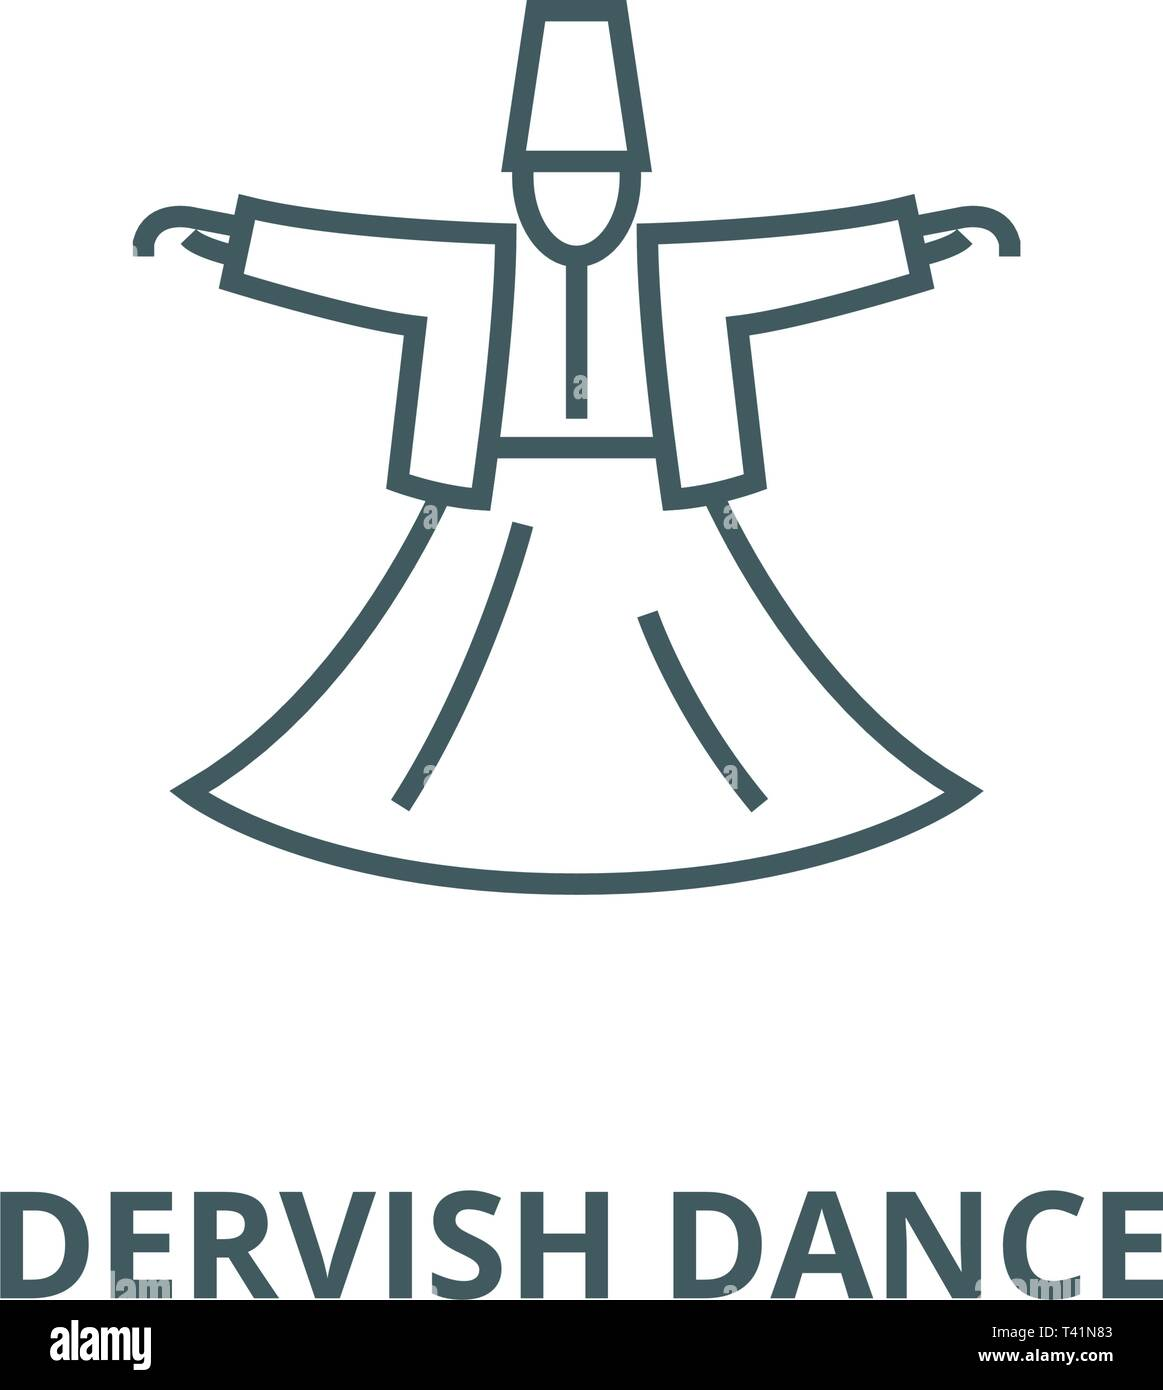 Dervish dance,islam line icon, vector. Dervish dance,islam outline sign, concept symbol, flat illustration - Stock Image